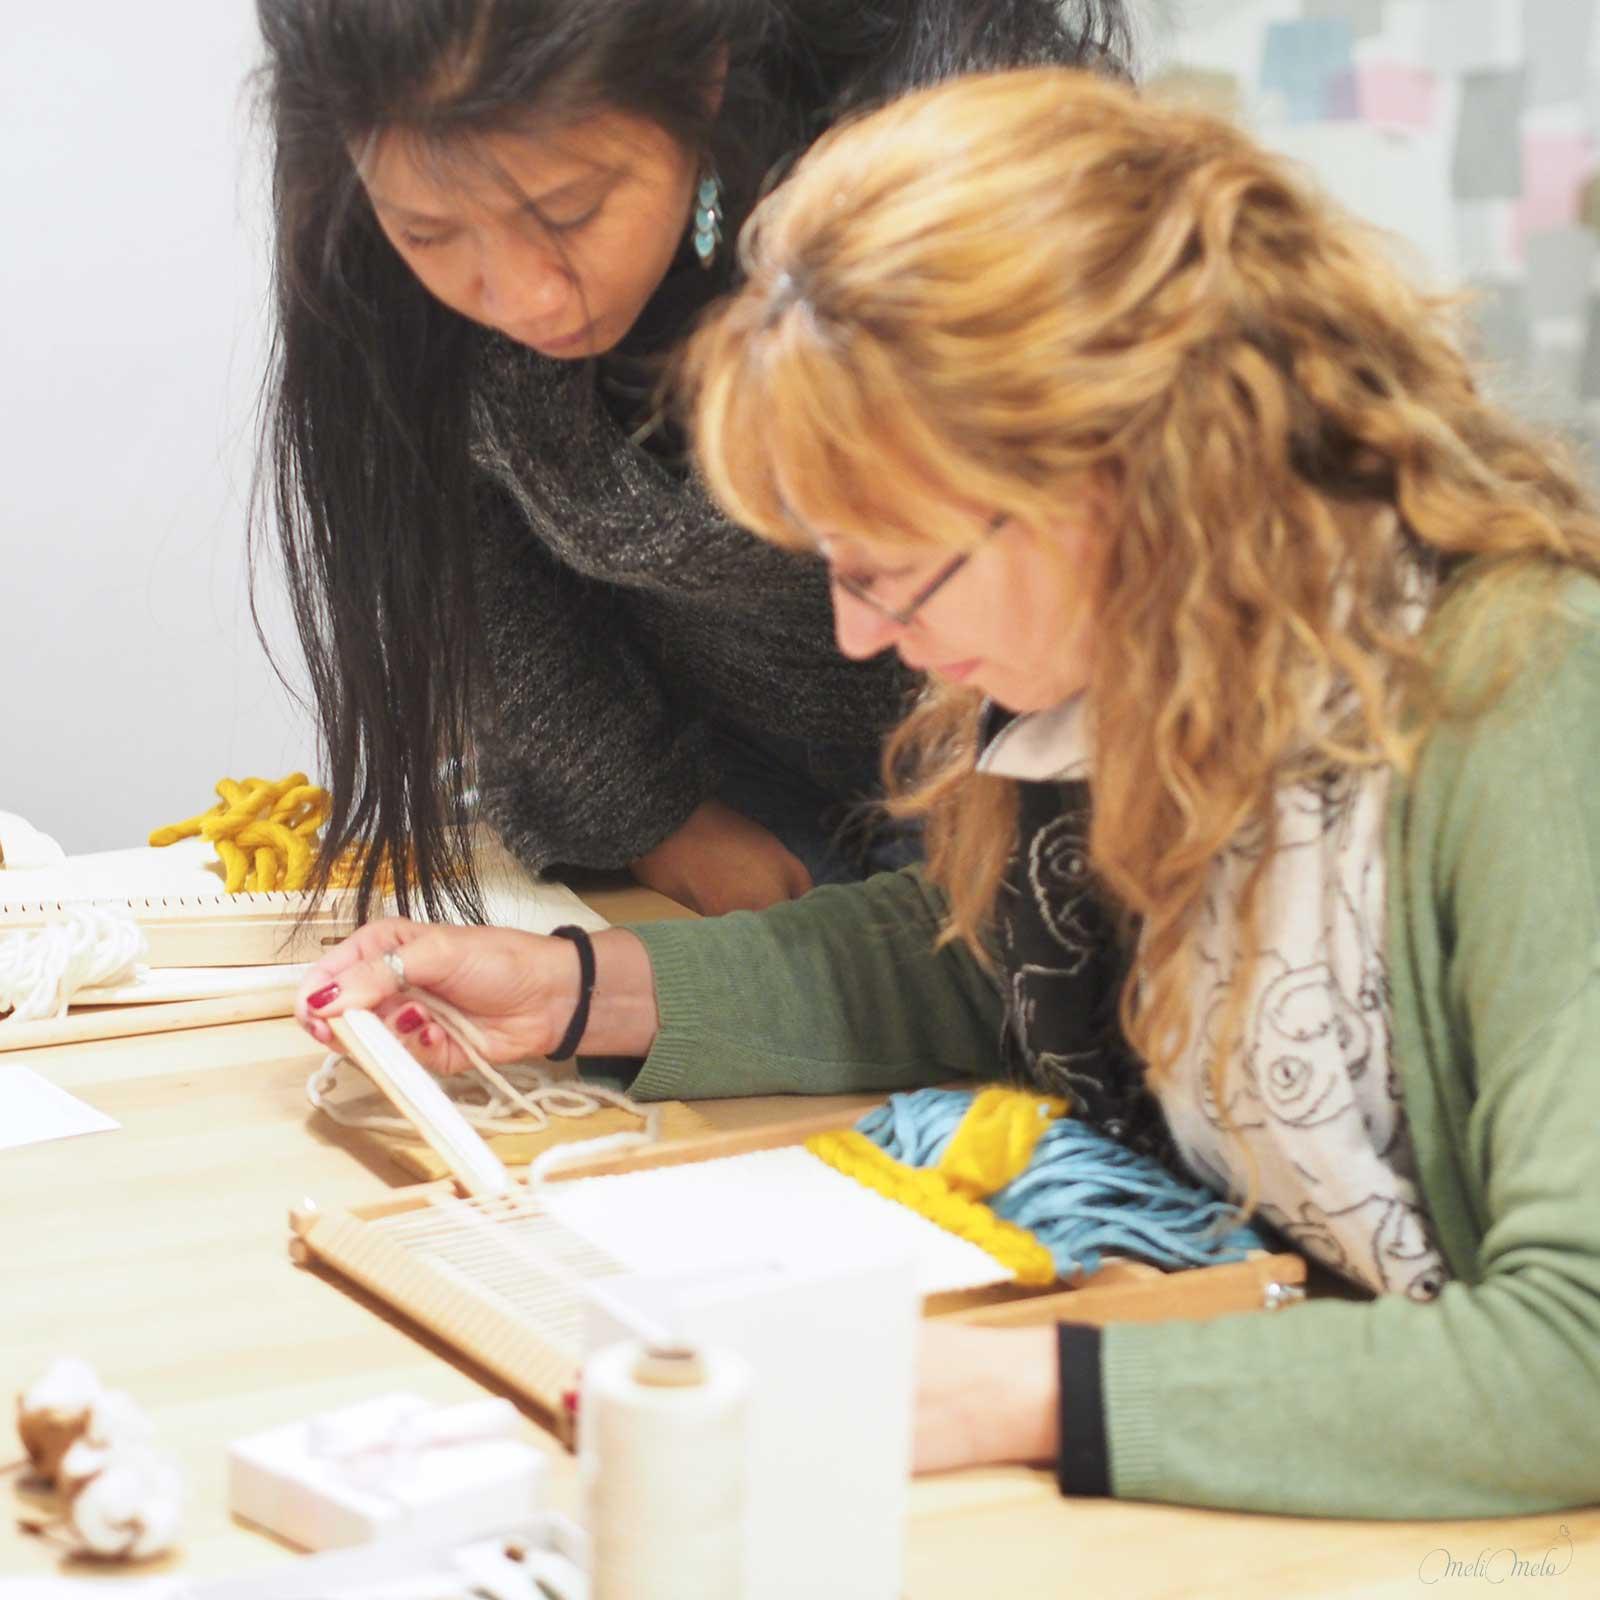 workshop atelier créatif tissage iv janvier Valladolid Mimarinita laboutiquedemelimelo